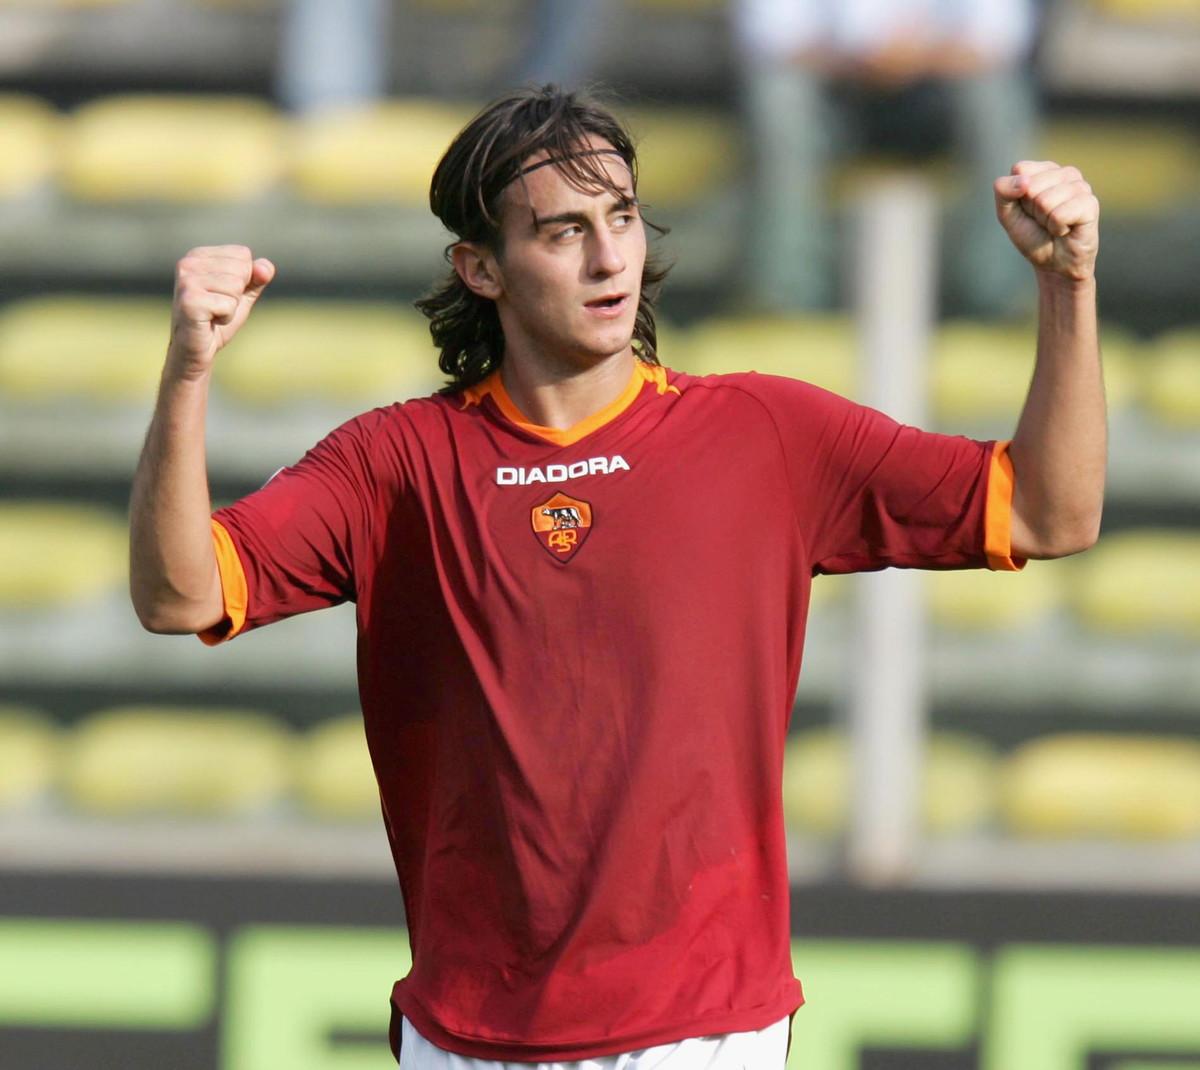 Alberto Aquilani (2002-03 e 2004-09 Roma, 2010-11 Juventus)